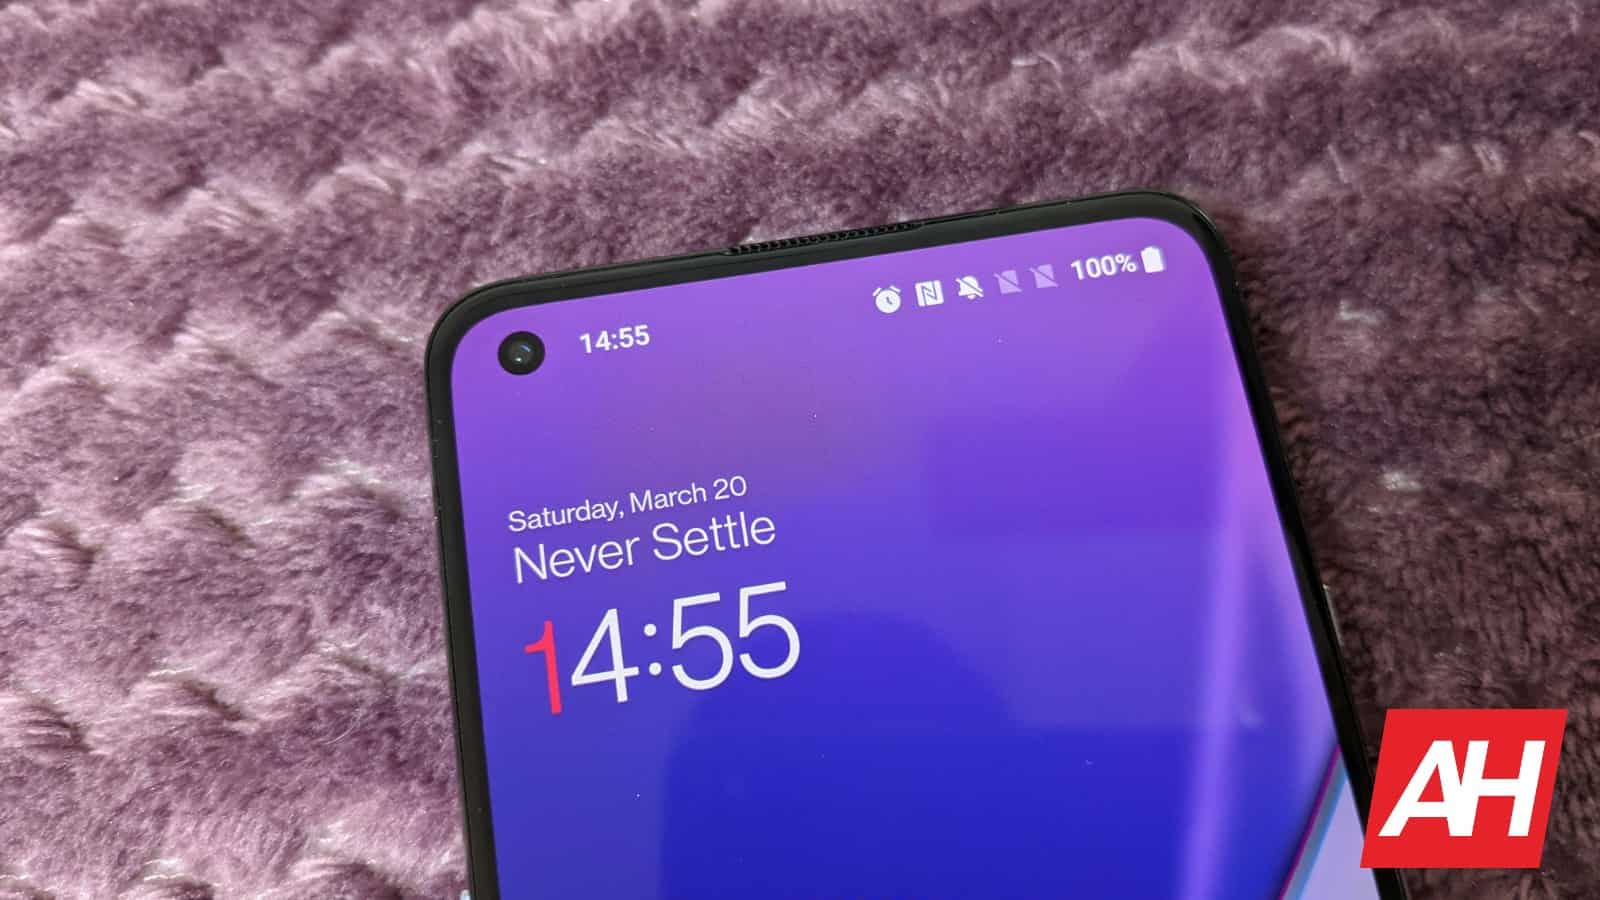 AH OnePlus 9 KL image 2